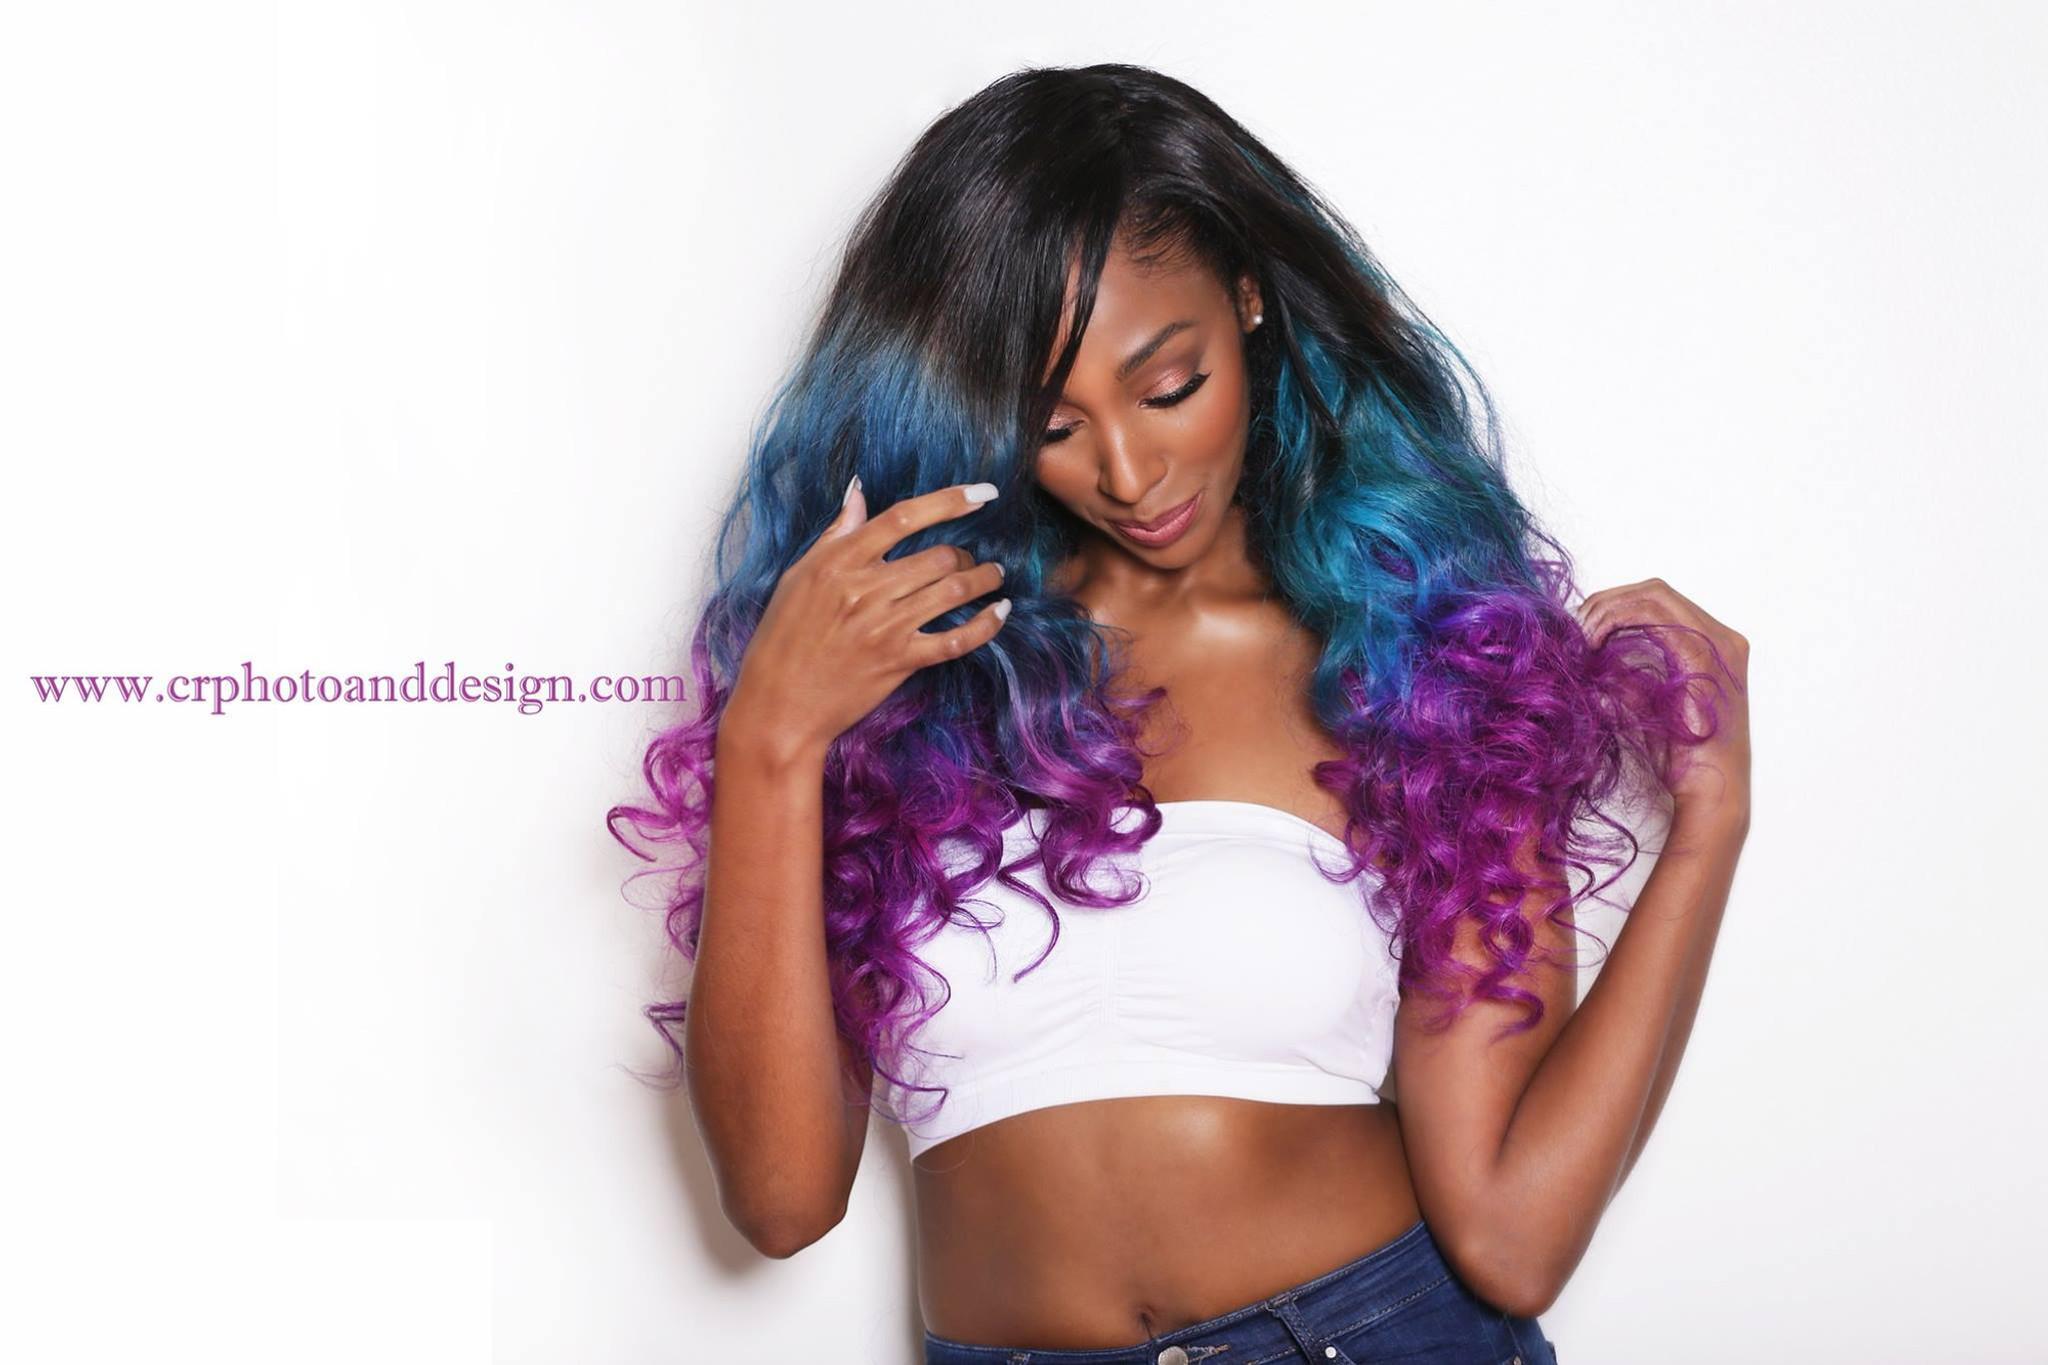 Hair/Clothing/Brand Shoots